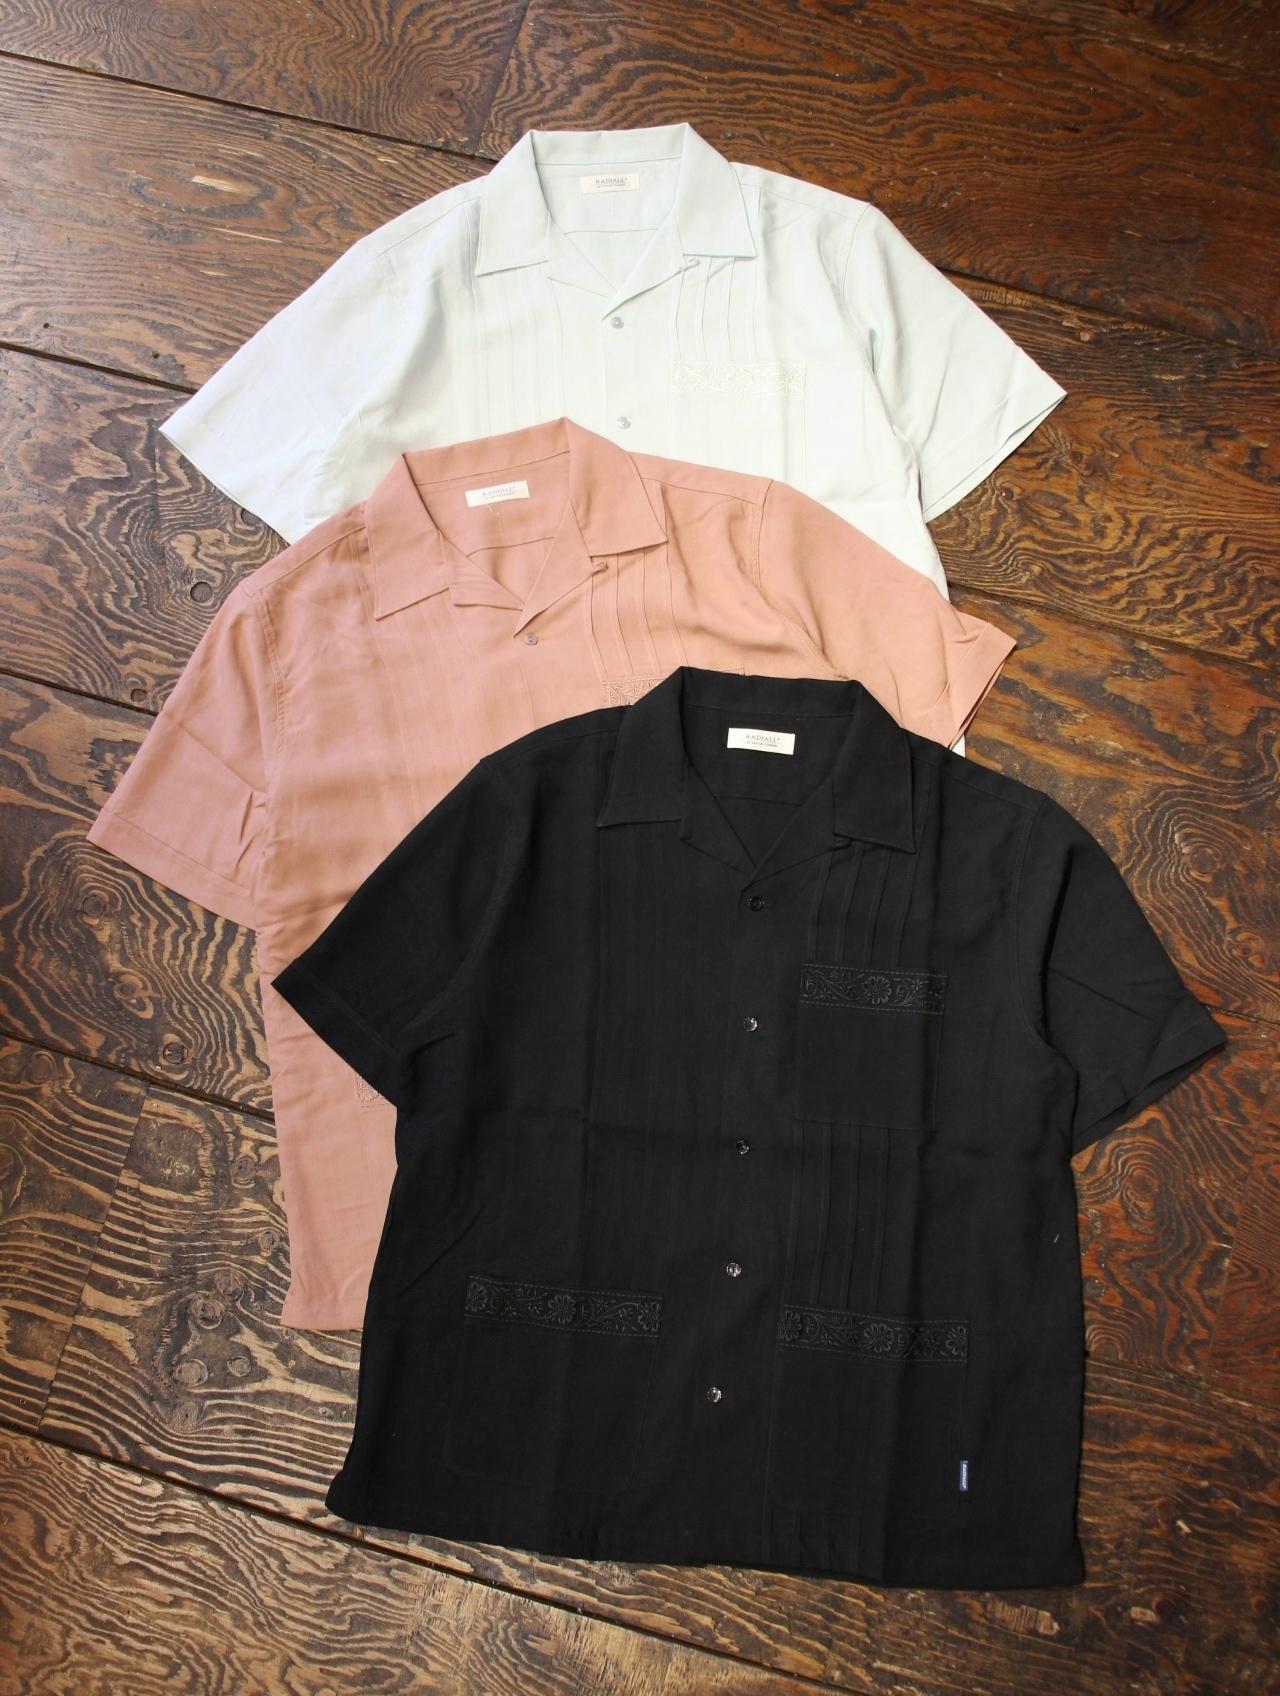 RADIALL  「MOJITO - OPEN COLLARED SHIRT S/S」  オープンカラーレーヨンキューバシャツ